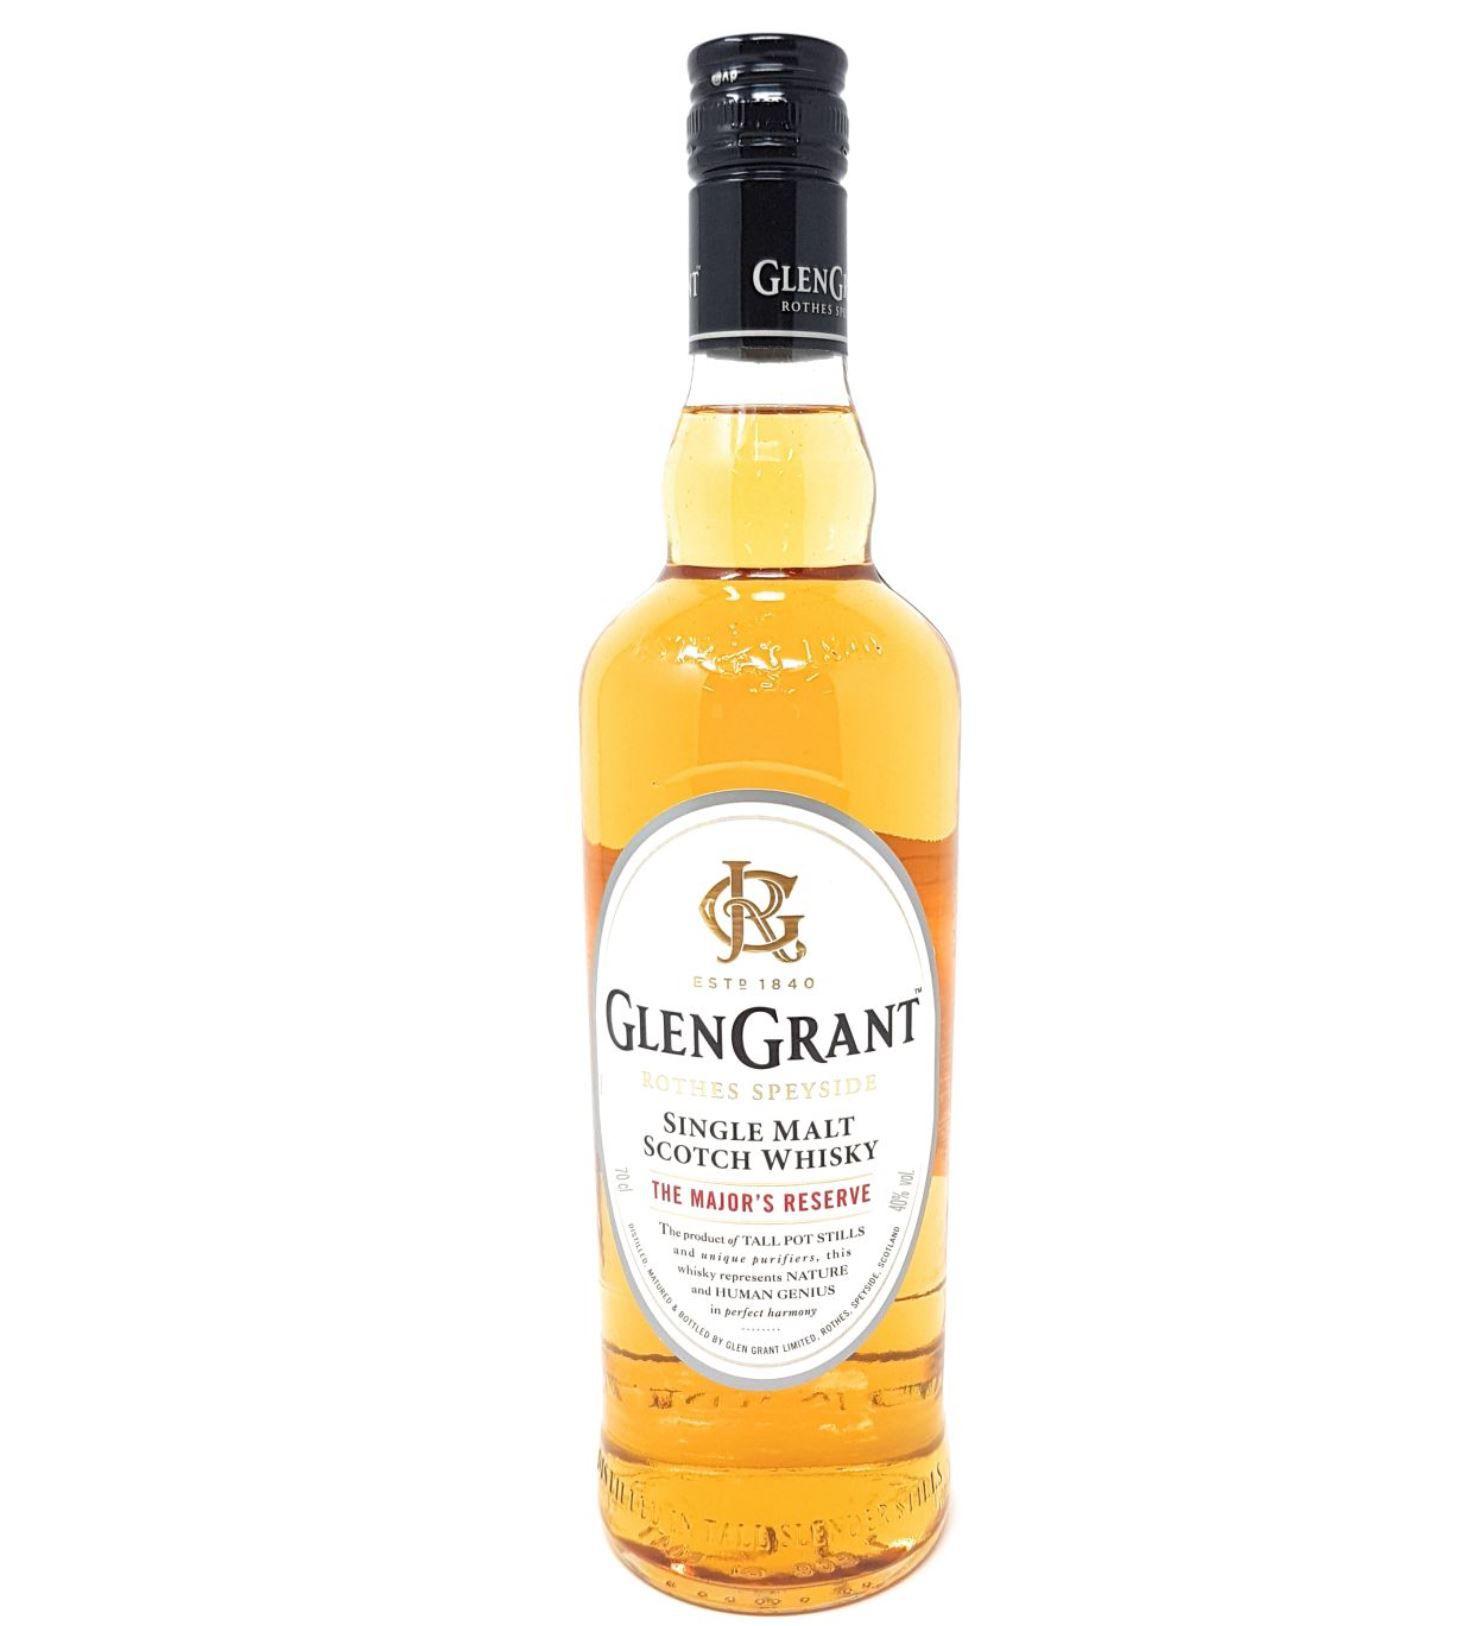 Ausverkauft! Glen Grant The Major's Reserve Single Malt Scotch Whisky für 12,99€ (statt 21€)